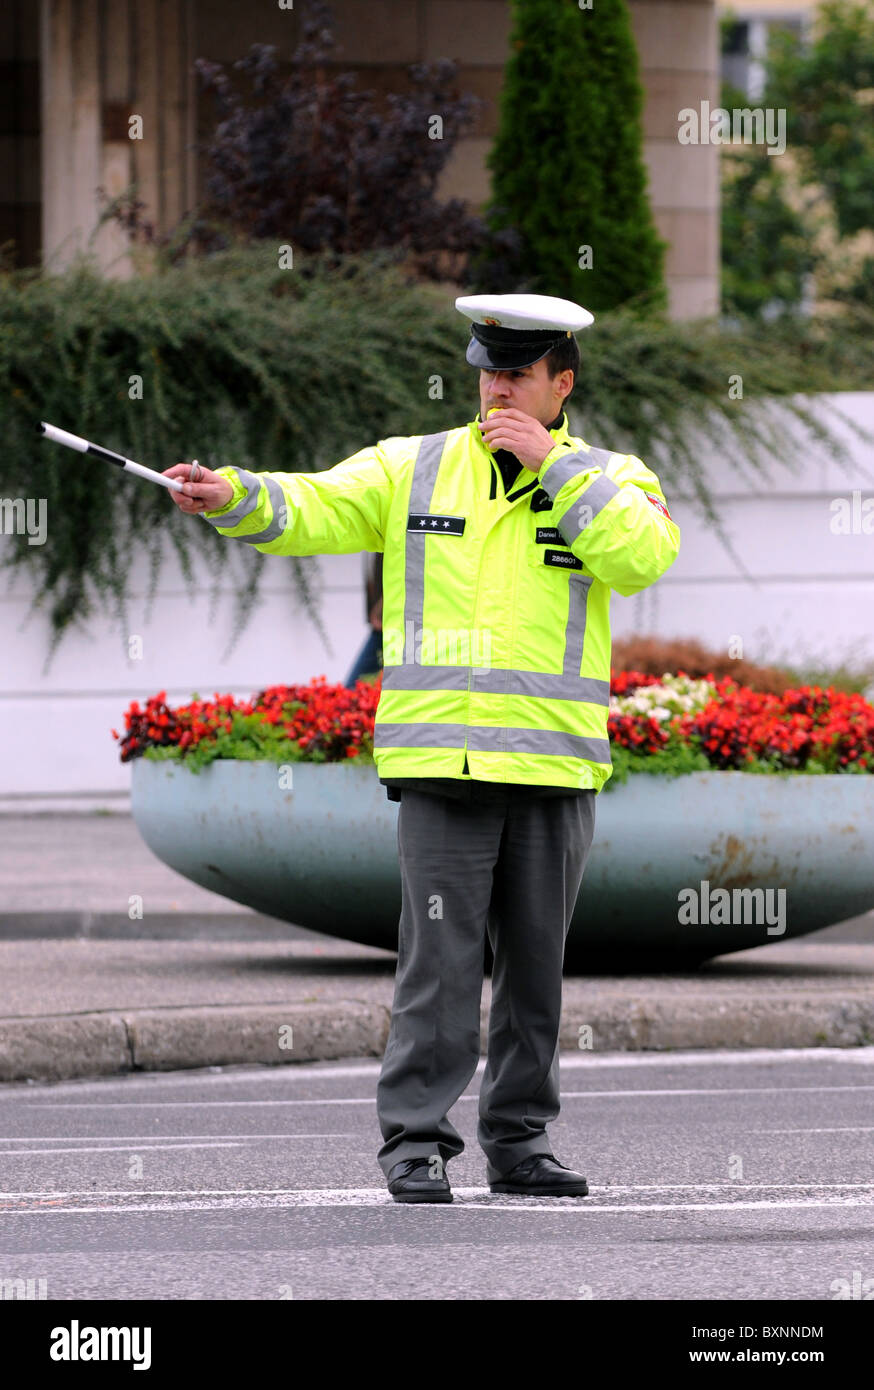 Policeman controlling traffic, Bratislava, Slovakia, Europe - Stock Image